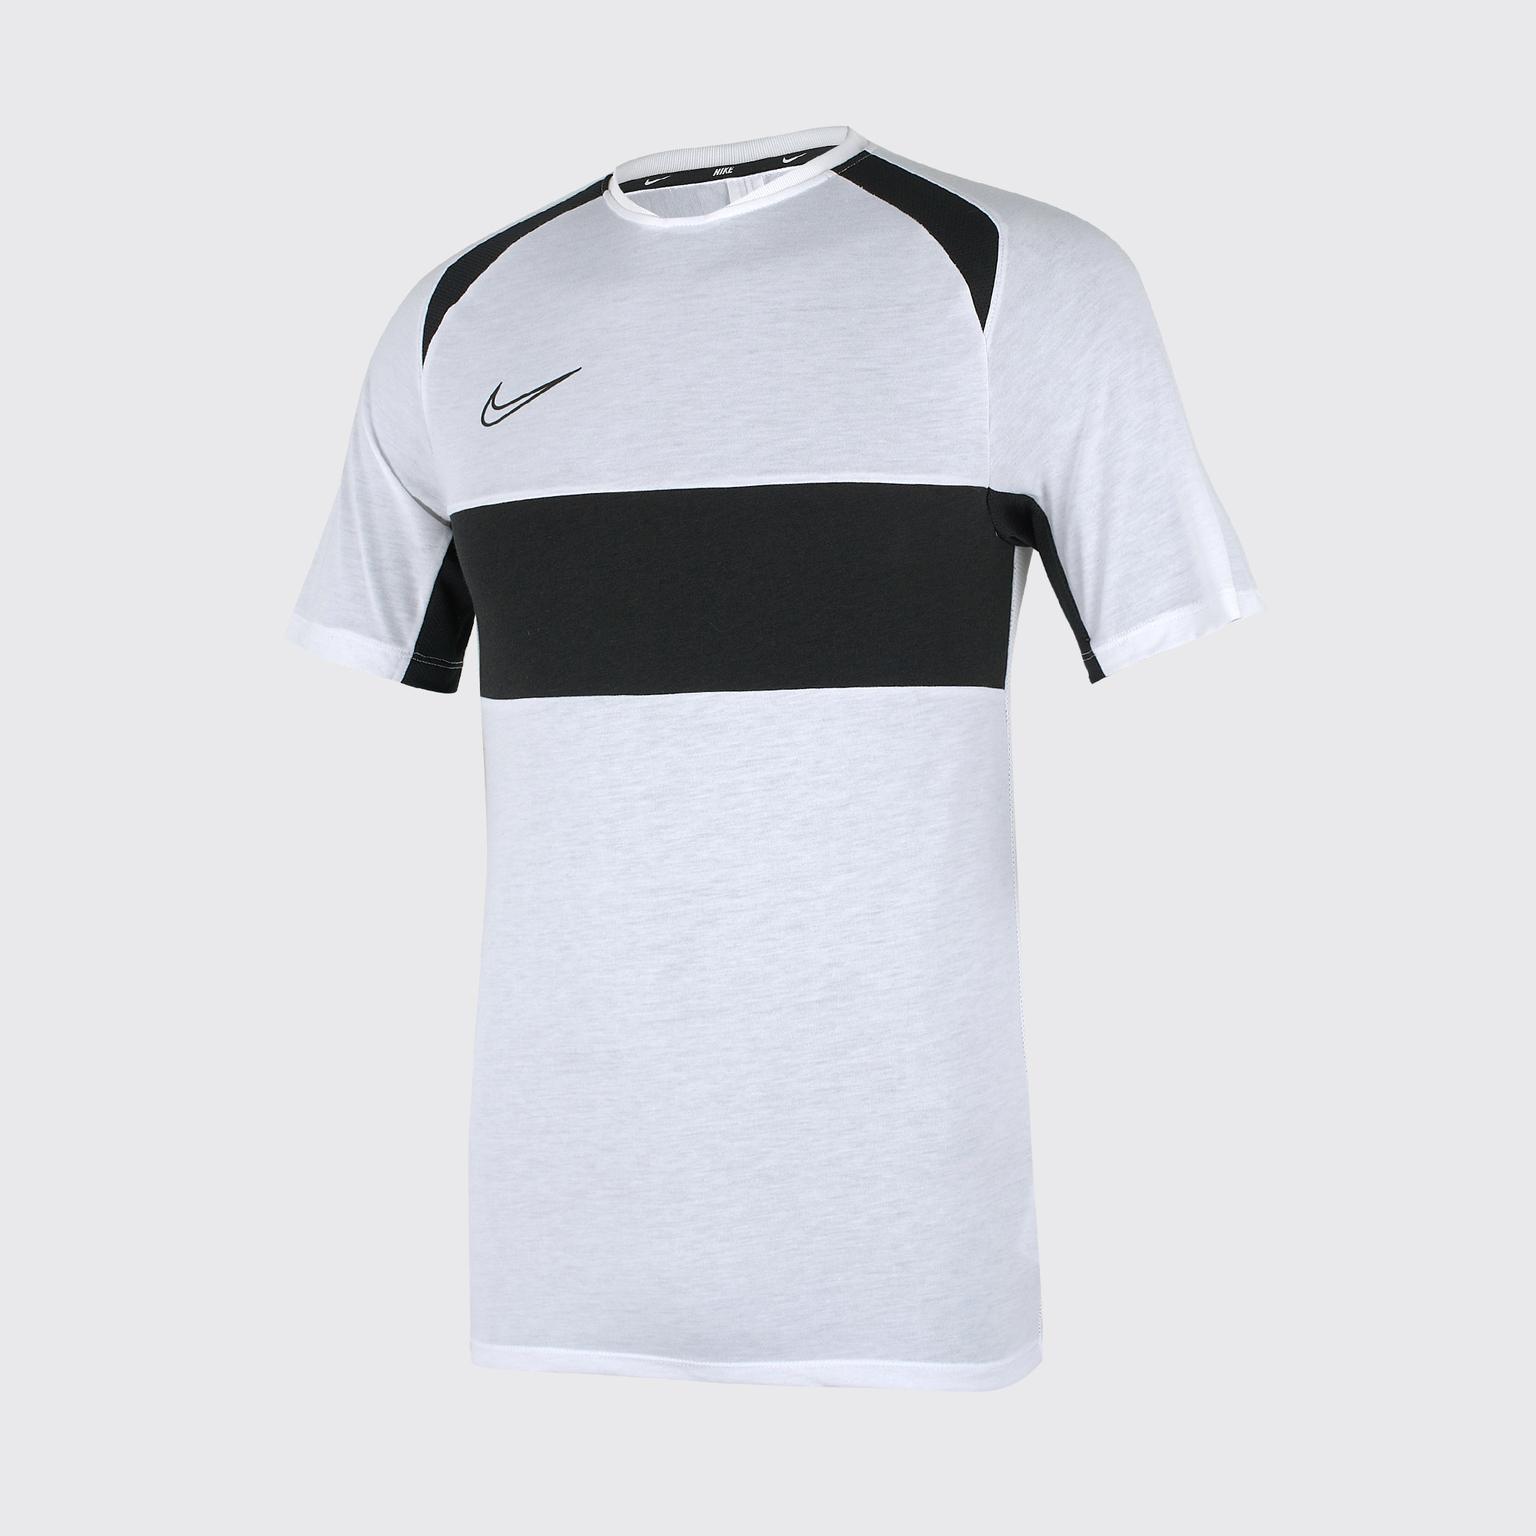 Футболка тренировочная Nike Dry Academy Top BQ7352-101 цена 2017